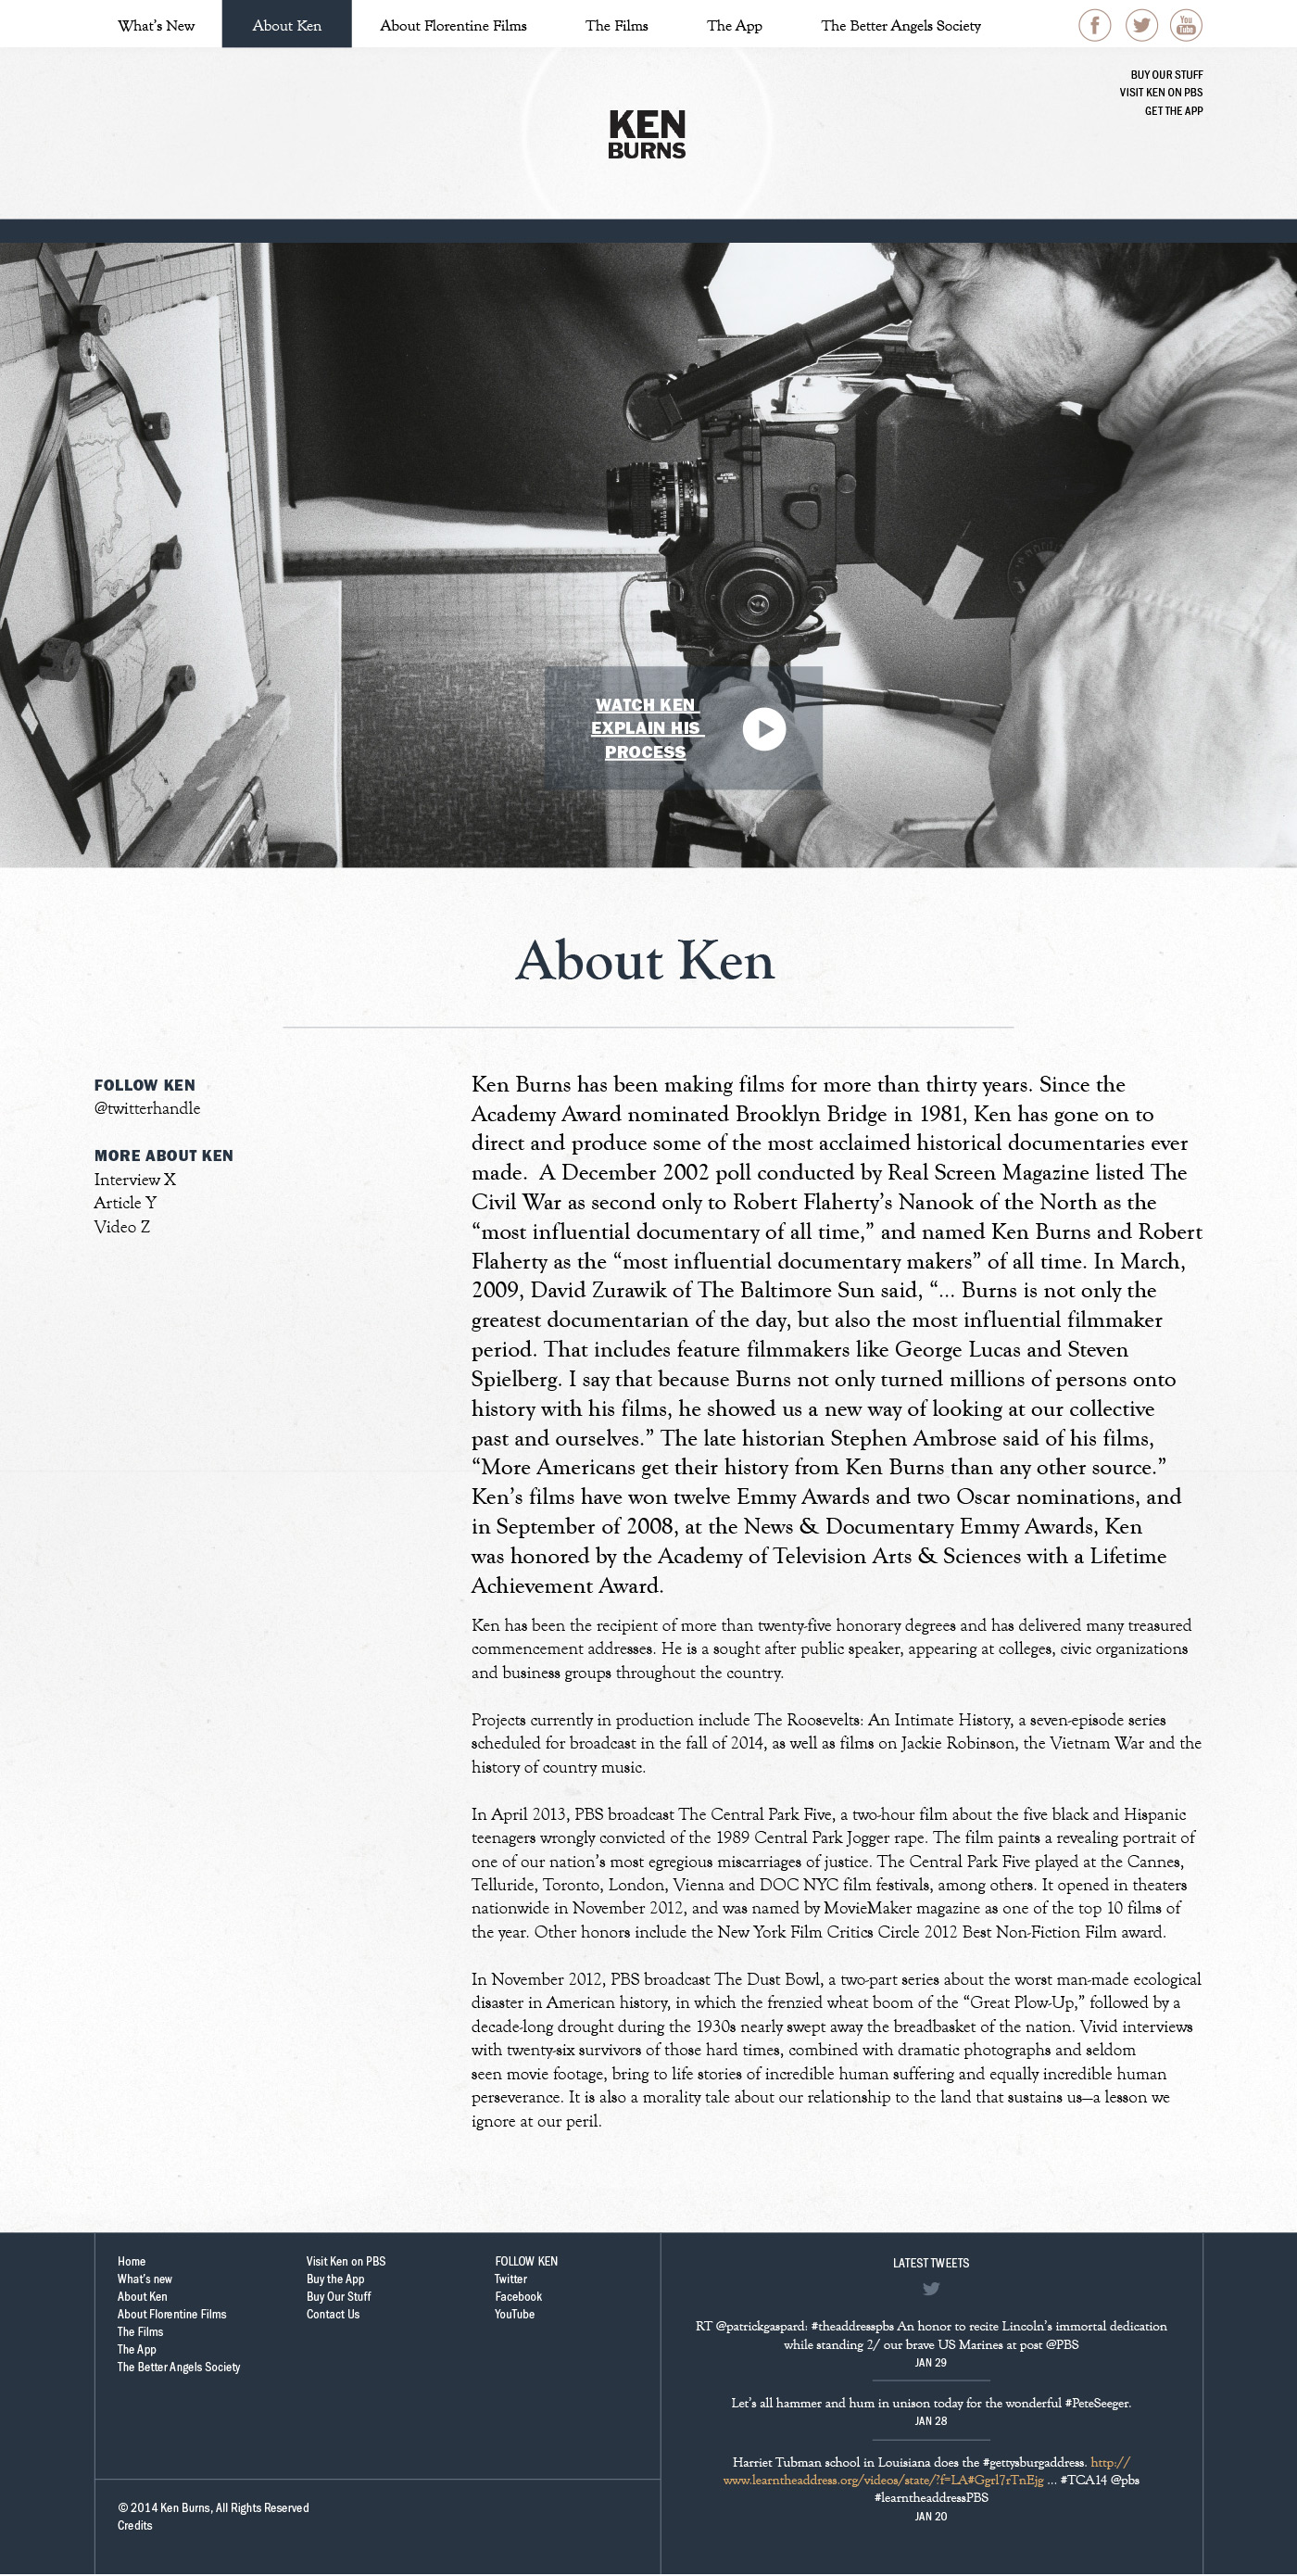 KB_Design_specs_140201-5-noframe.jpg